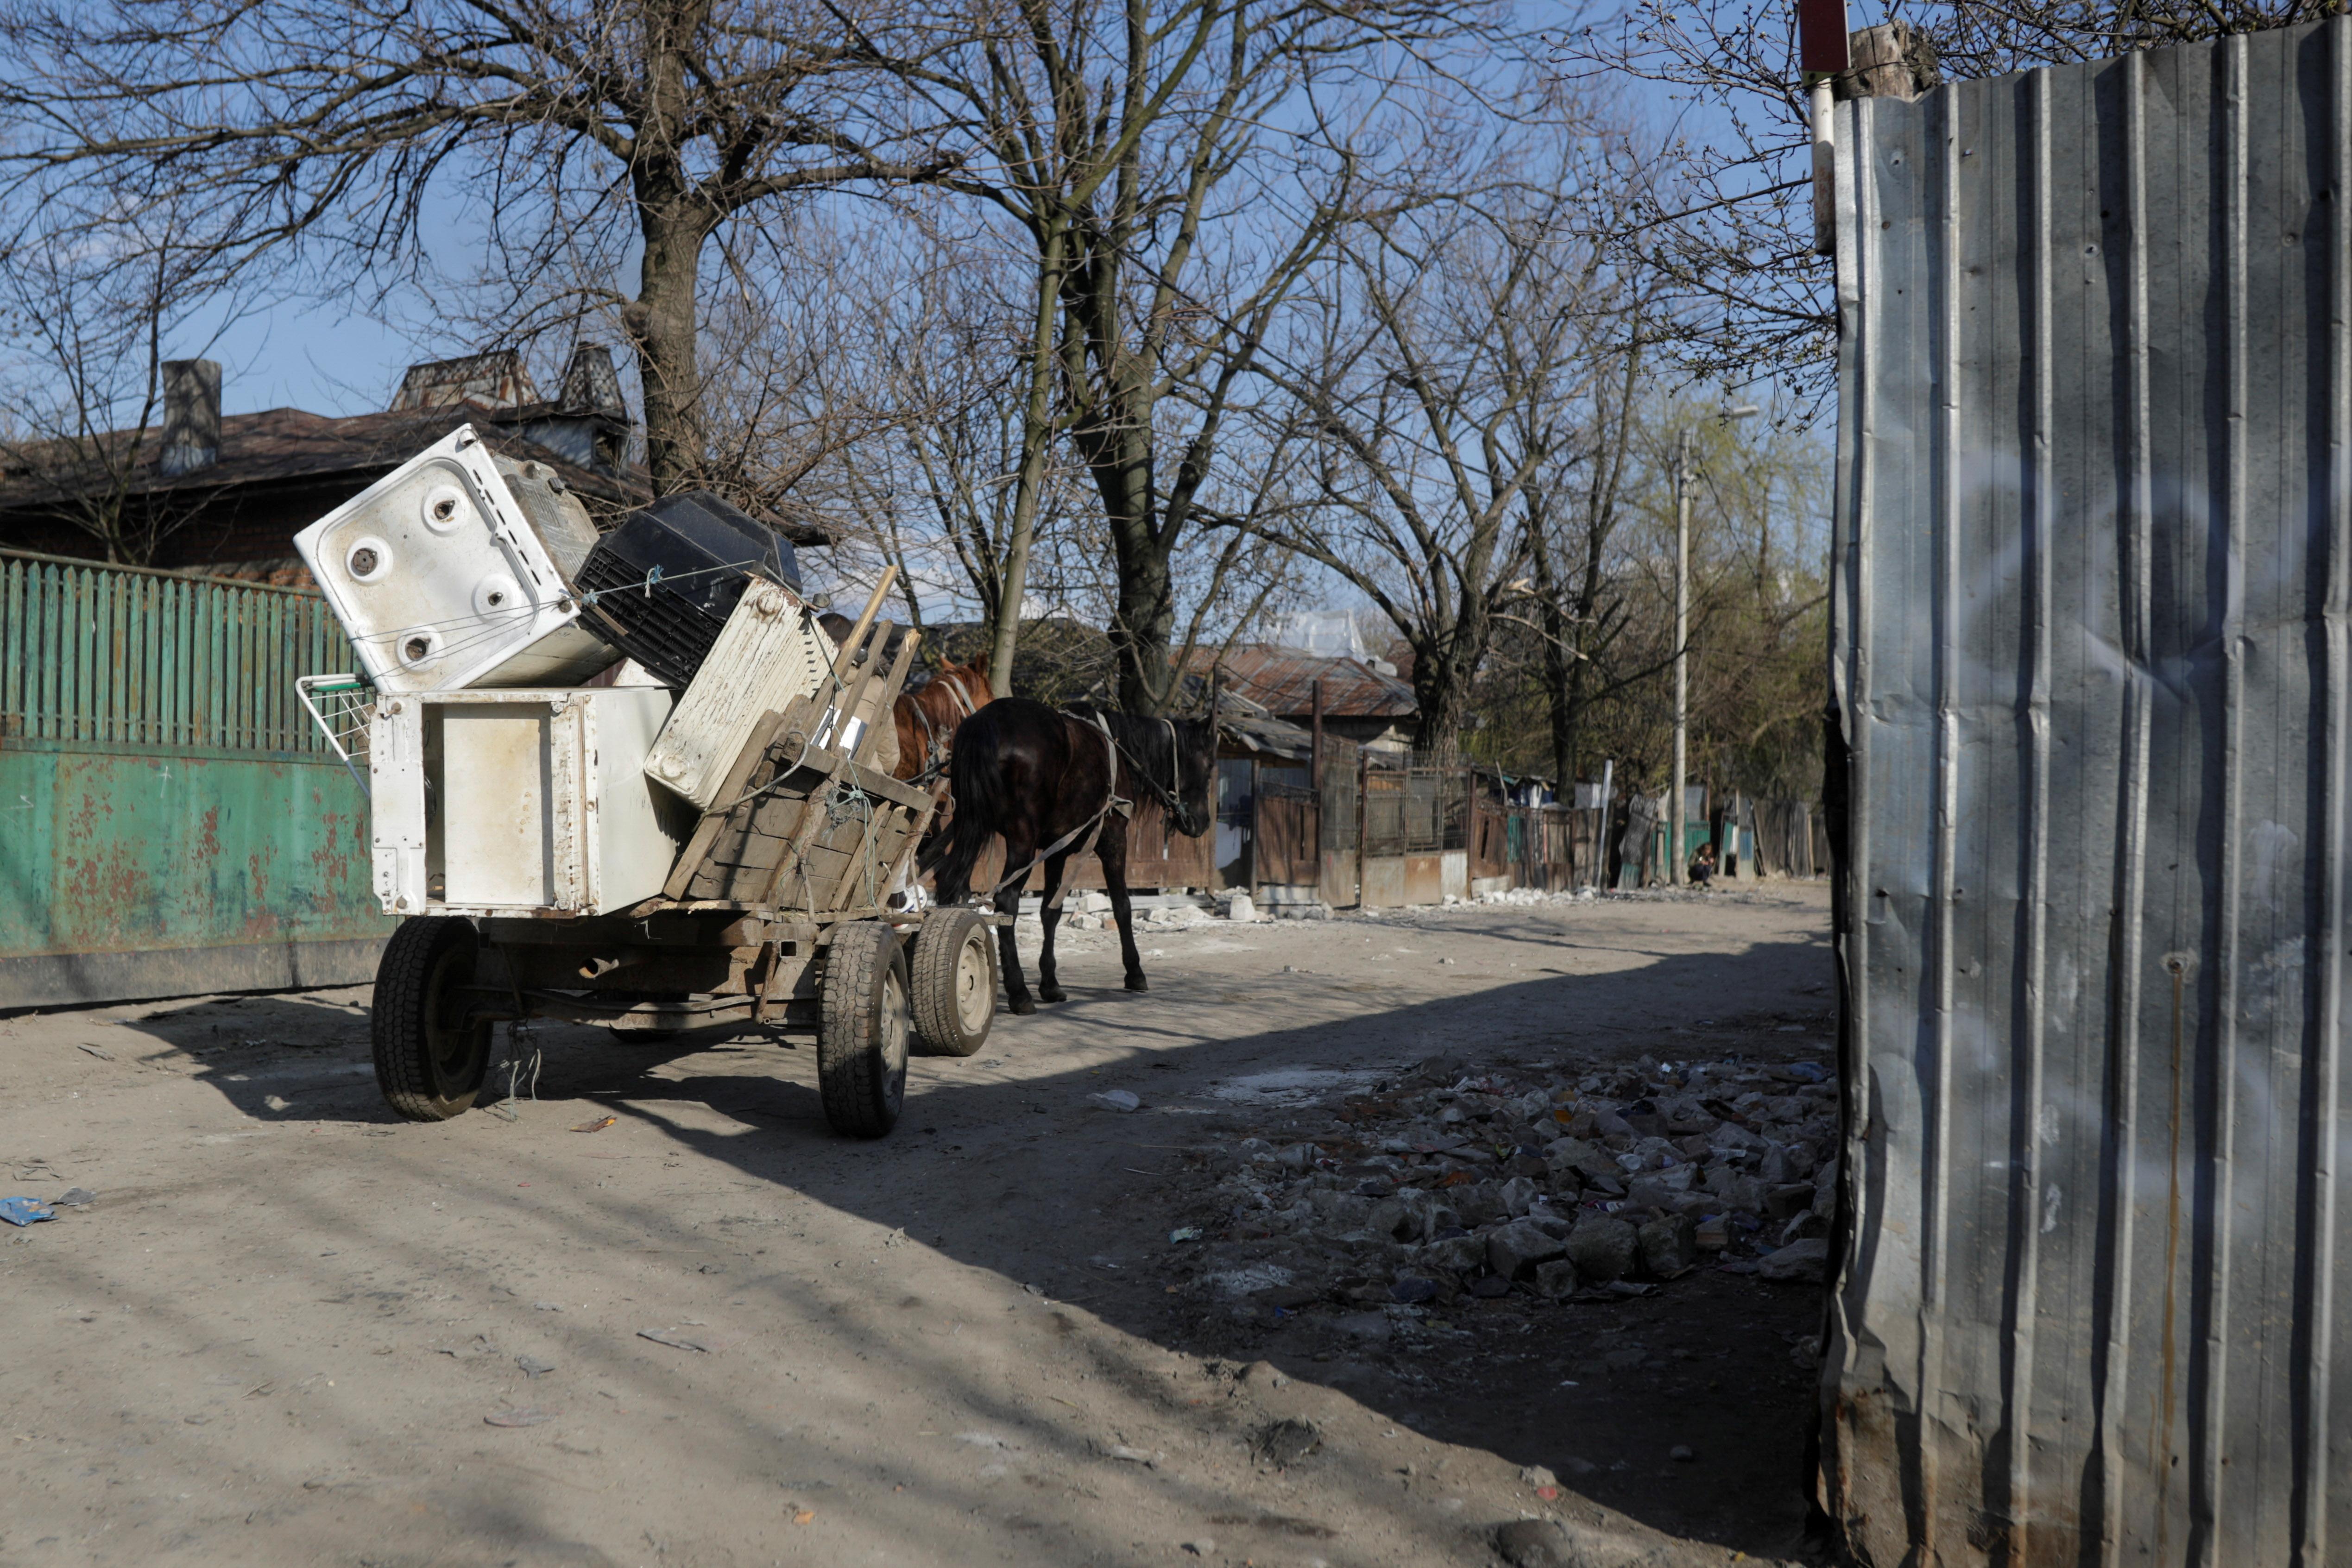 A horse-drawn carriage carries domestic appliance waste on the mud street of Sintesti village, Ilfov, Romania, April 9, 2021.Inquam Photos/George Calin via REUTERS